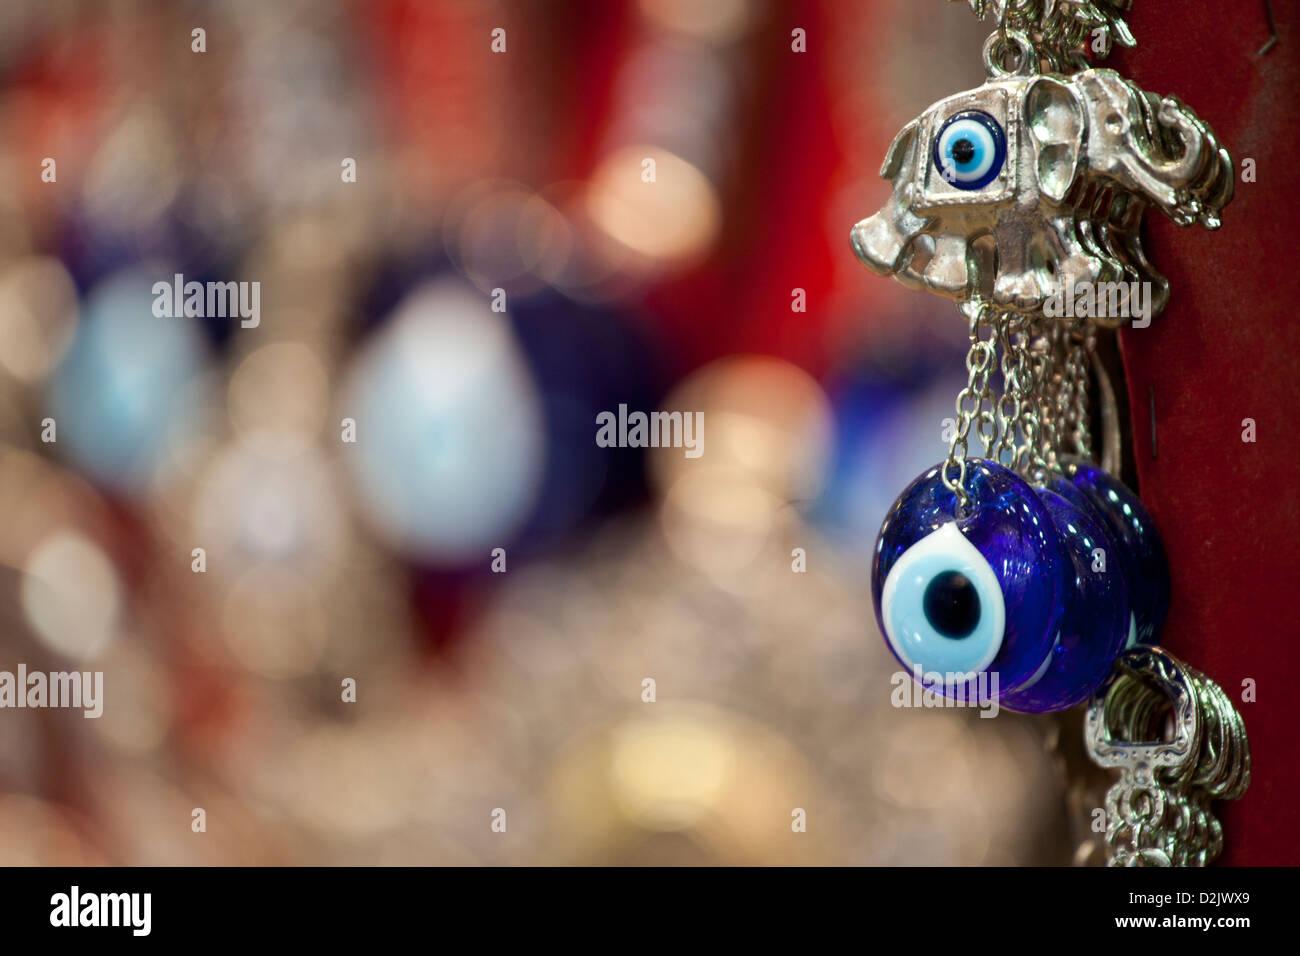 Türkische Glücksbringer bead Amulett, Symbol des Schutzes vor bösen Blick. Basar Kapali Carsi Kapalicarsi, Stockbild